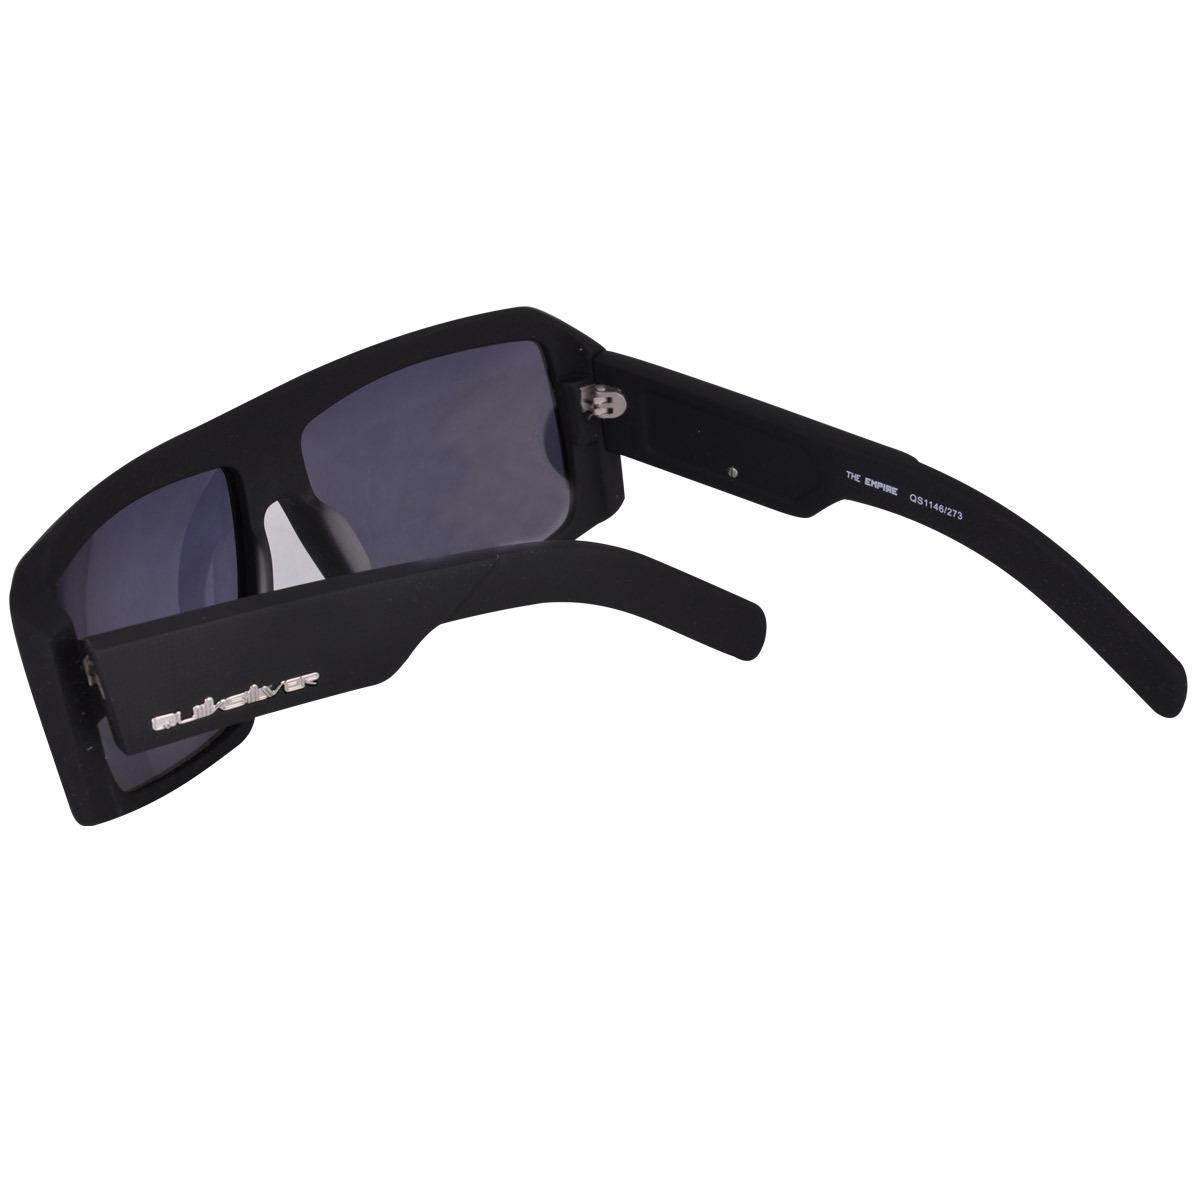 1840e462bc60e Óculos Quiksilver The Empire Ii Preto - Cut Wave - R  119,90 em ...